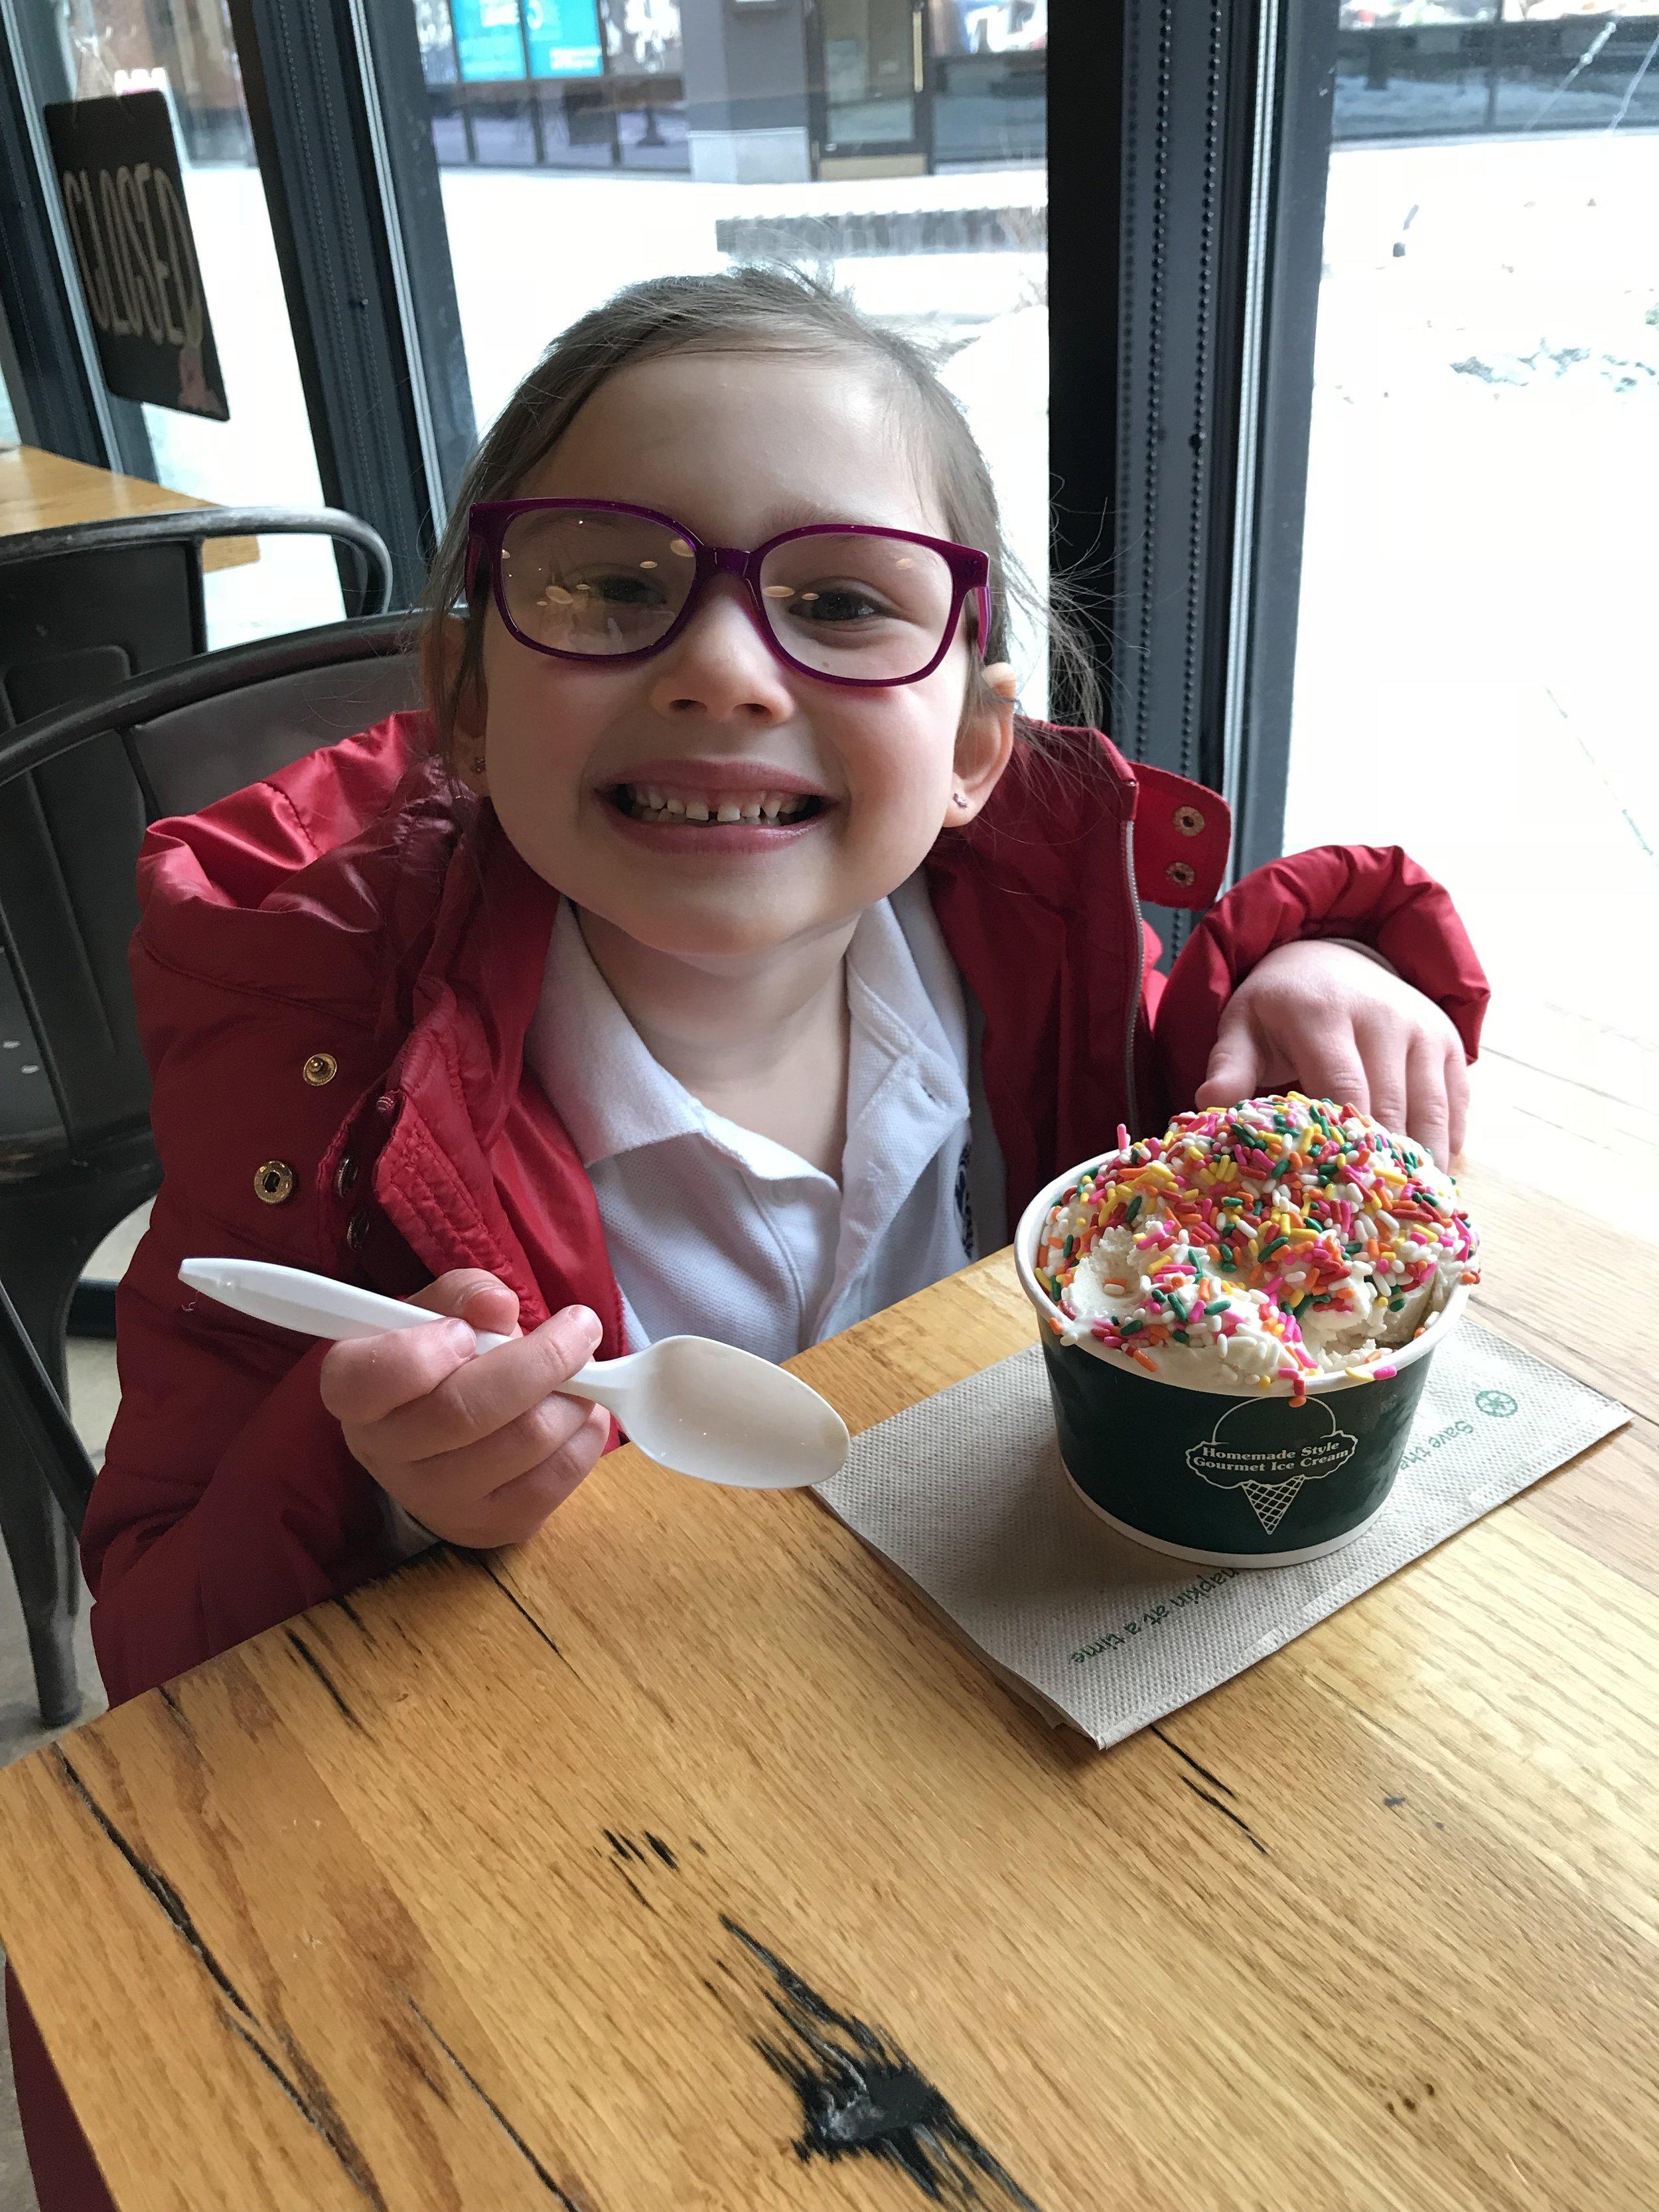 Bedford Farms Ice Cream Happy Customer.JPG